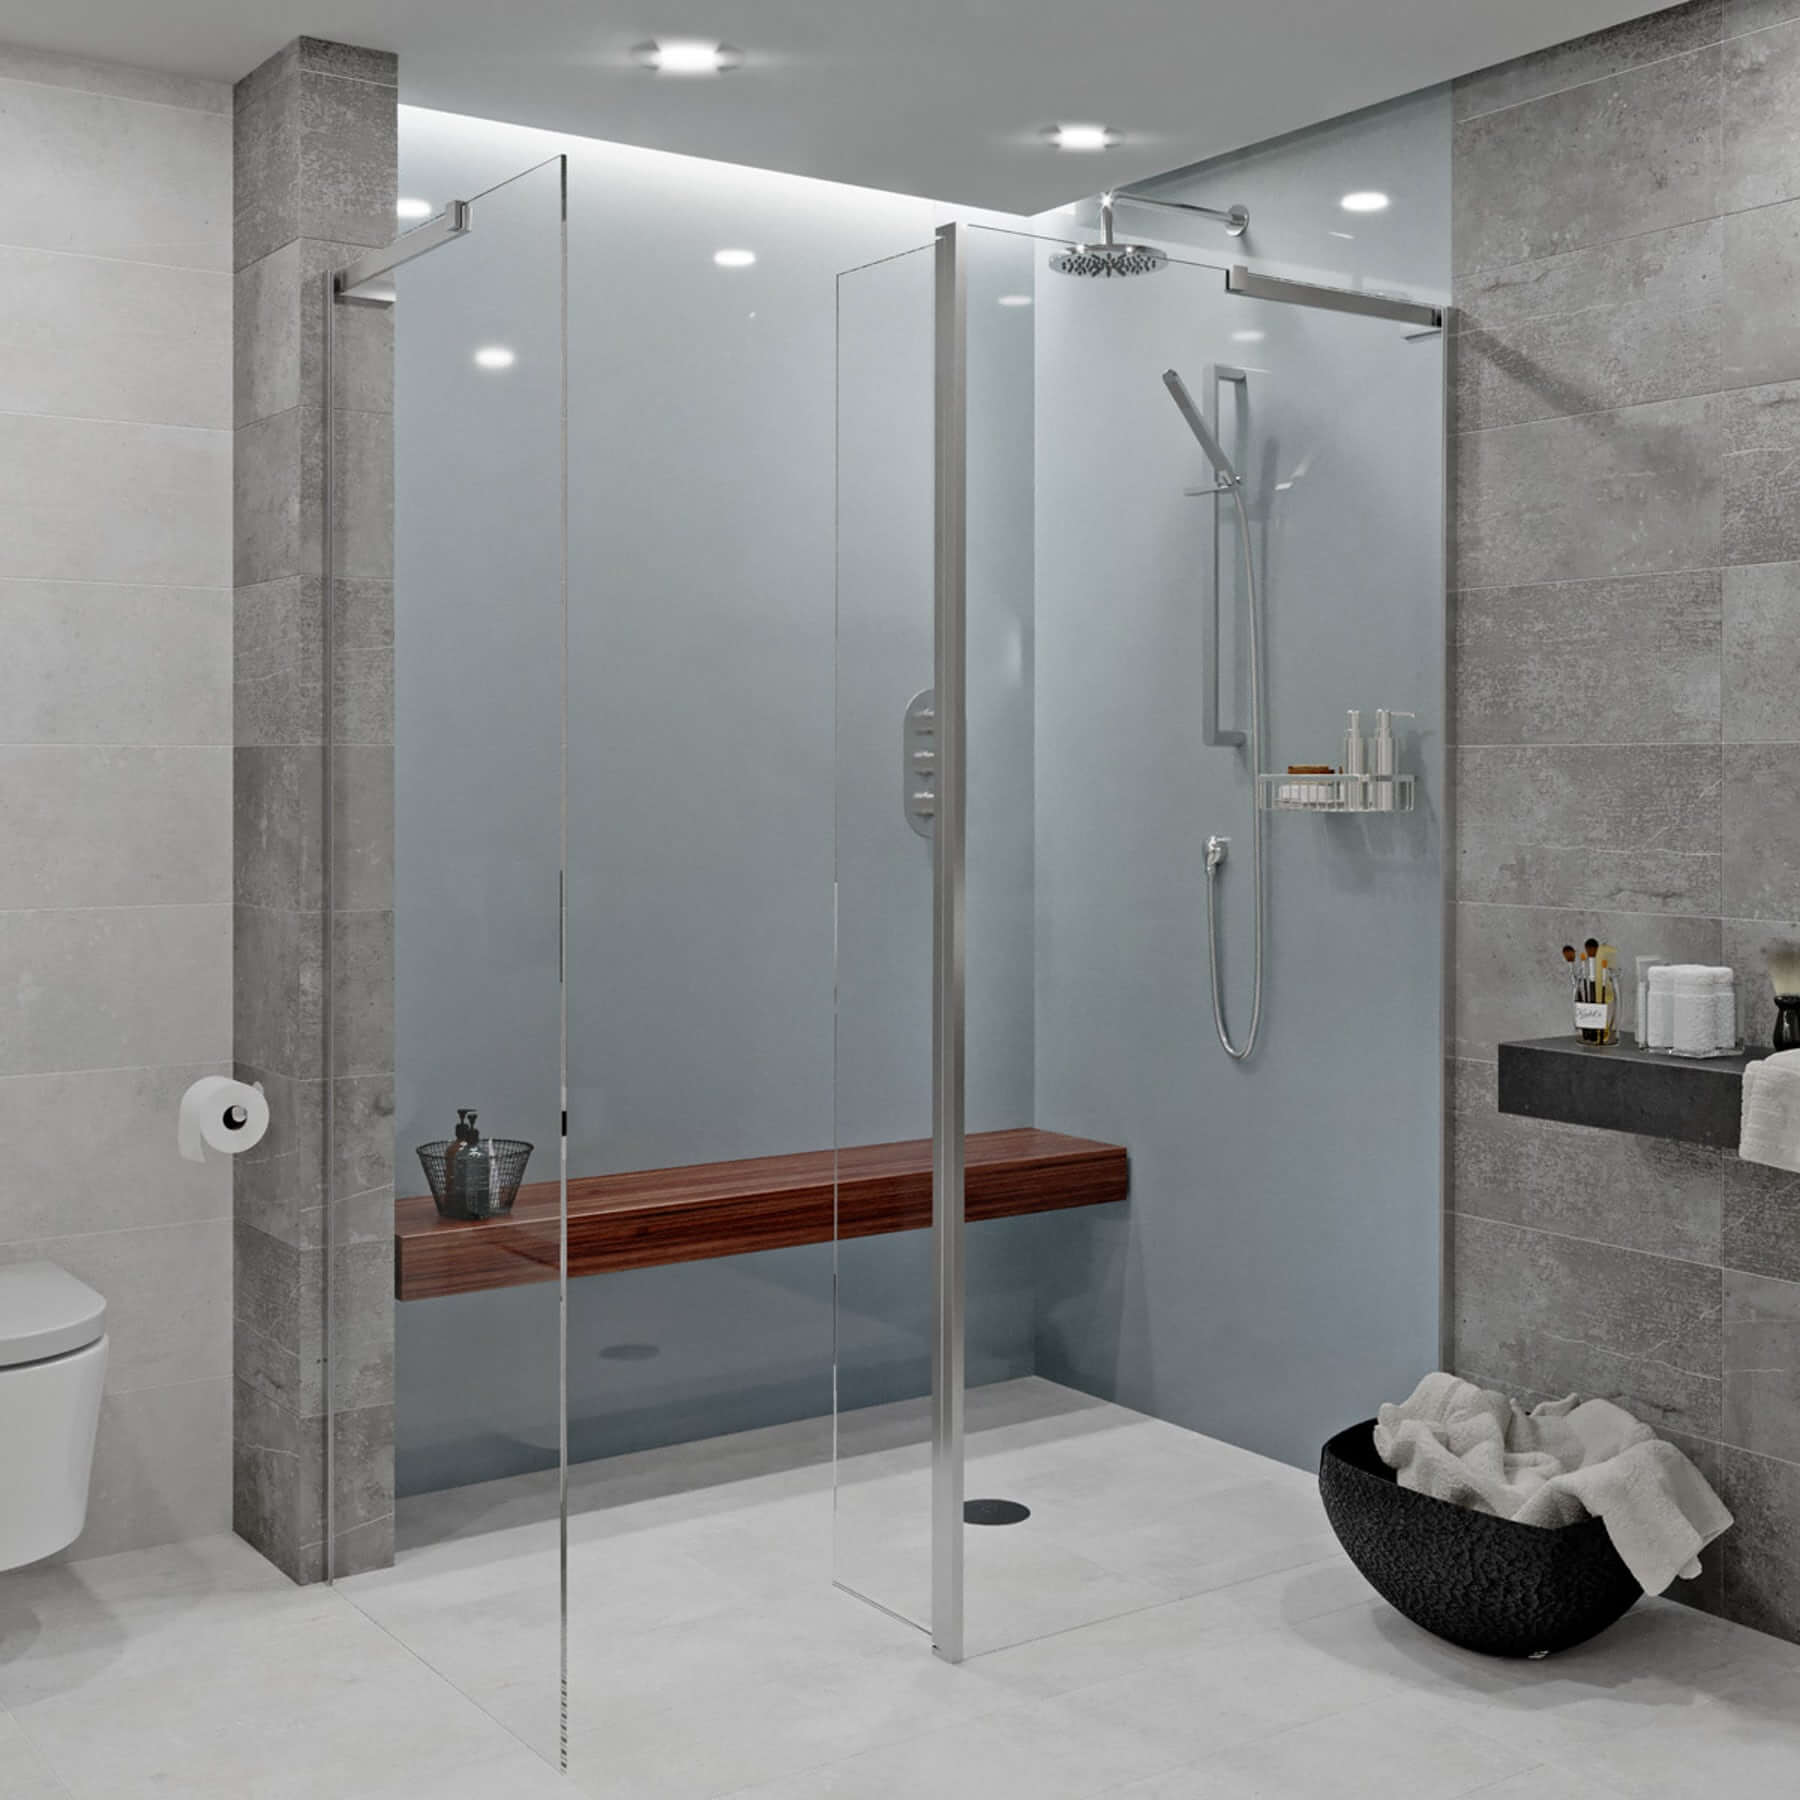 Gunmetal Acrylic Showerwall in a shower